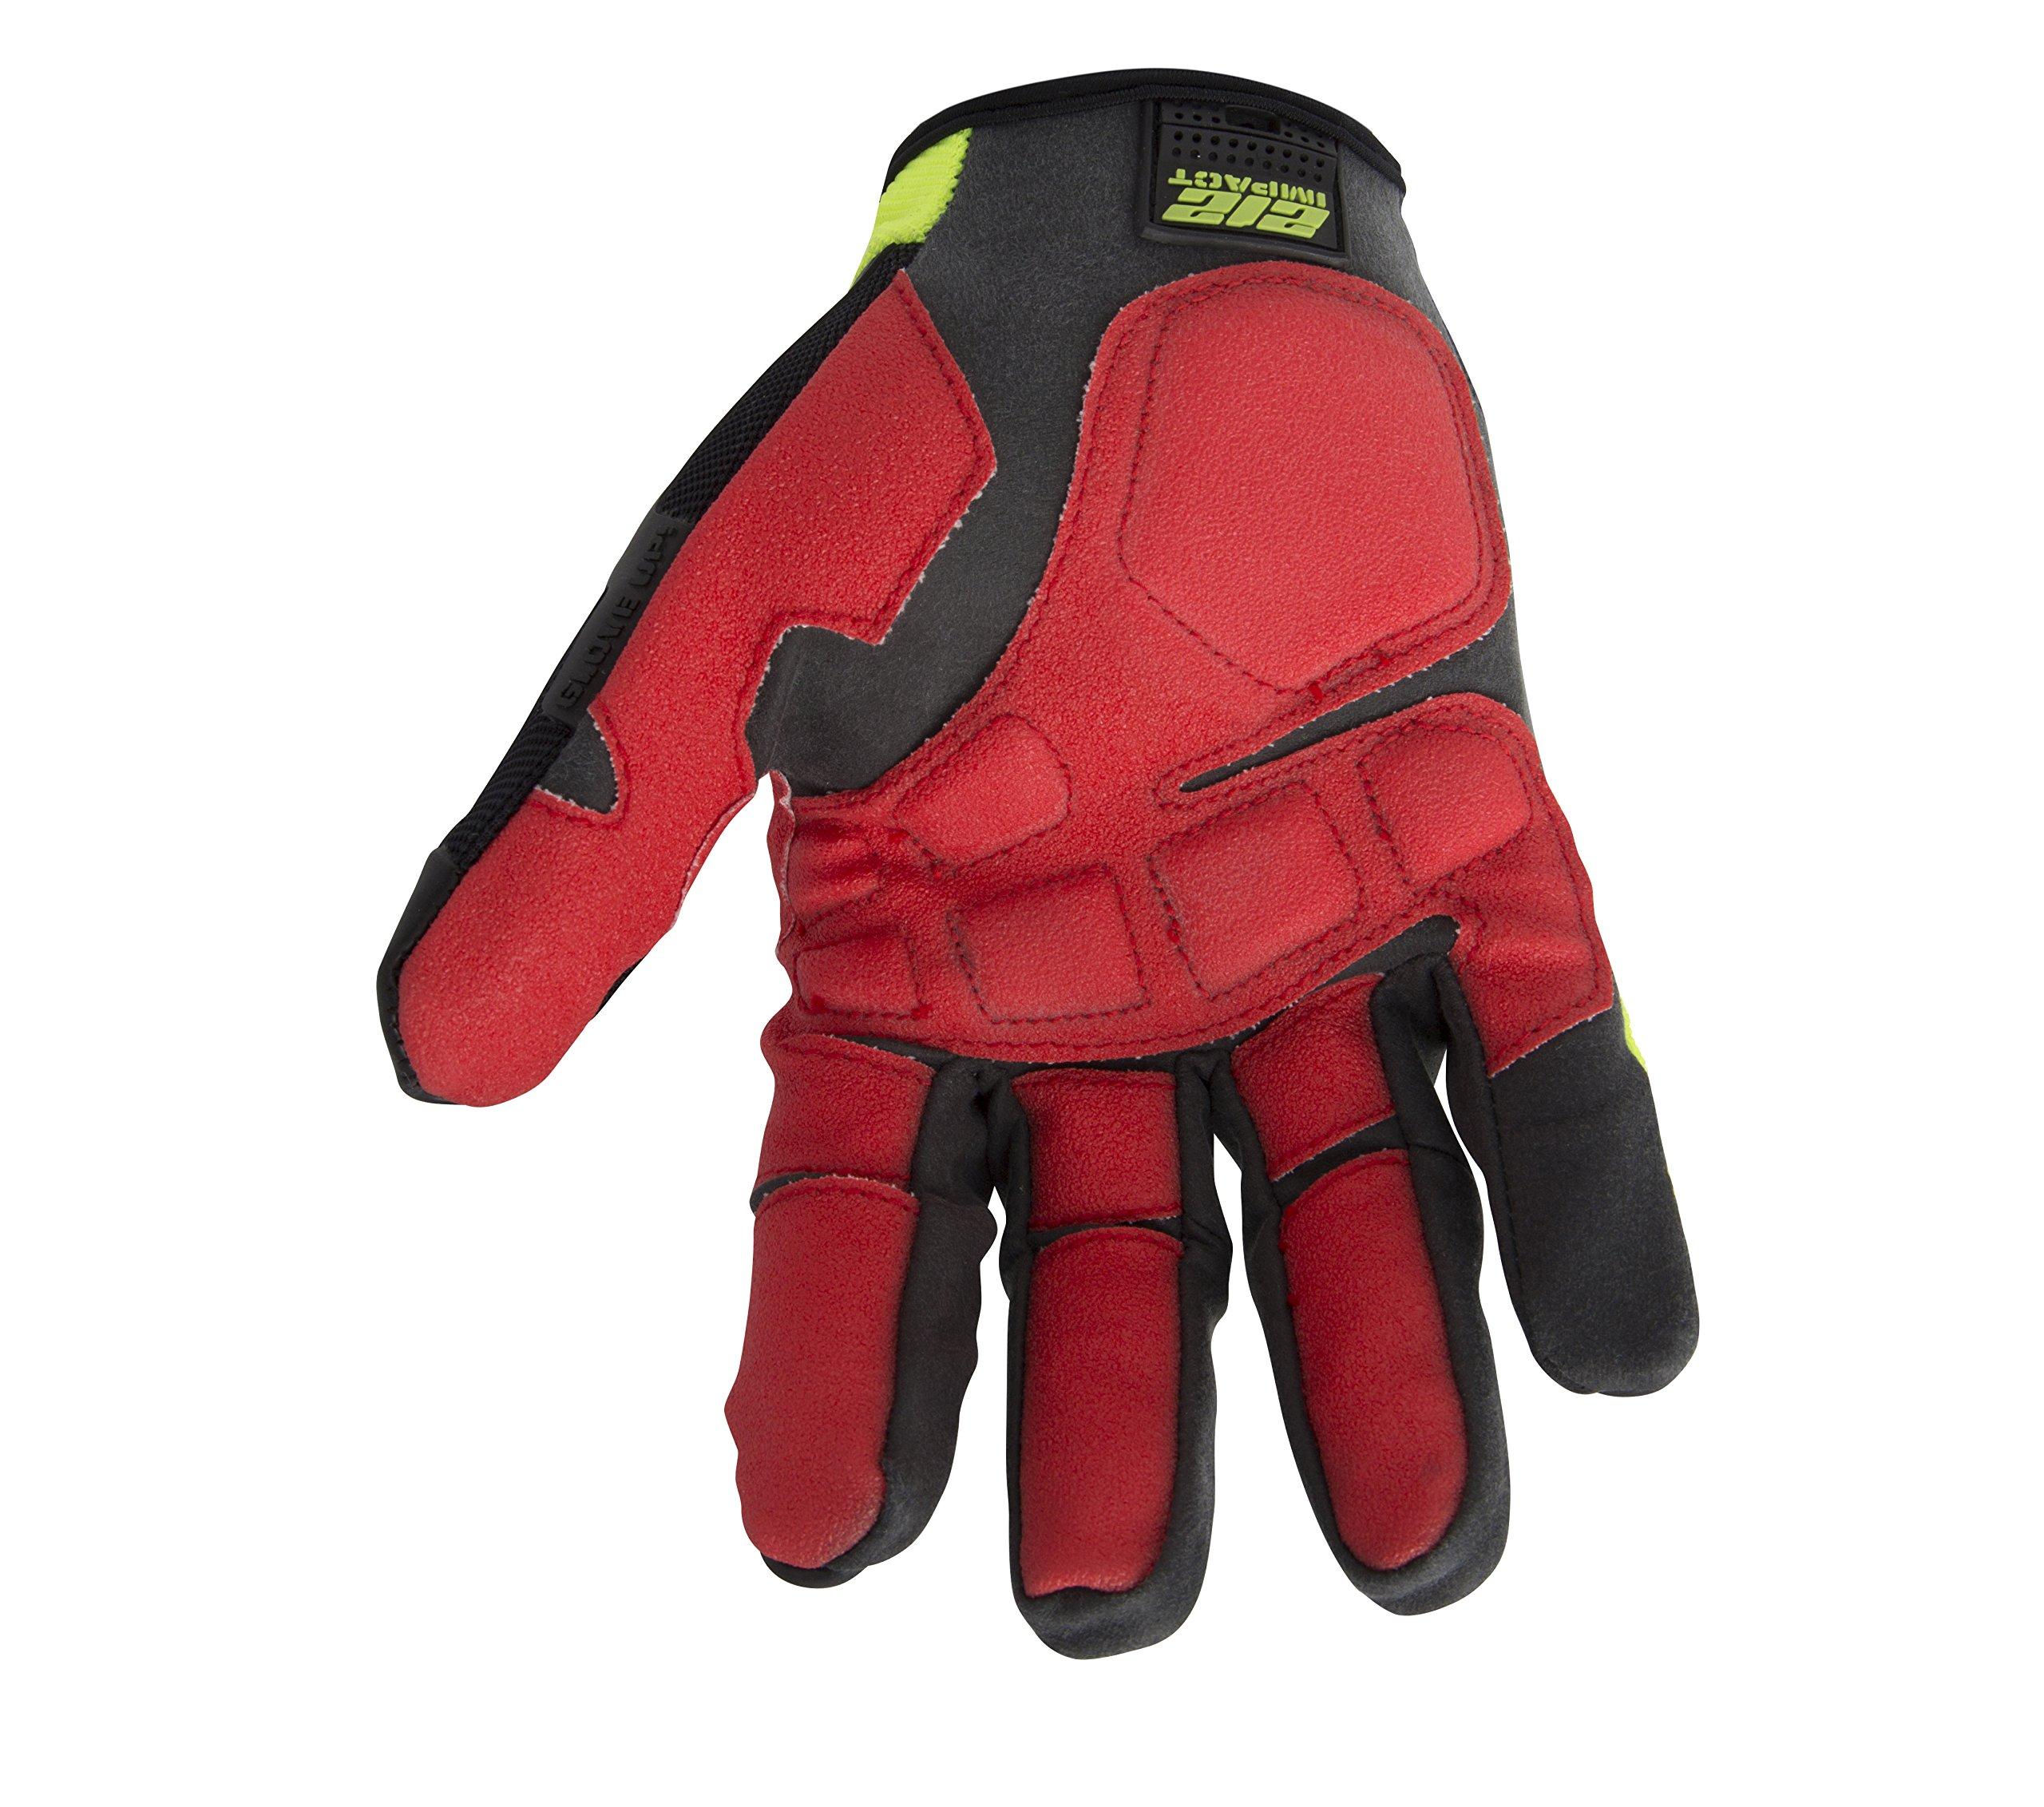 212 Performance Gloves IMP-88-009 Super Hi-Vis Impact Gloves, Medium by 212 Performance Gloves (Image #2)